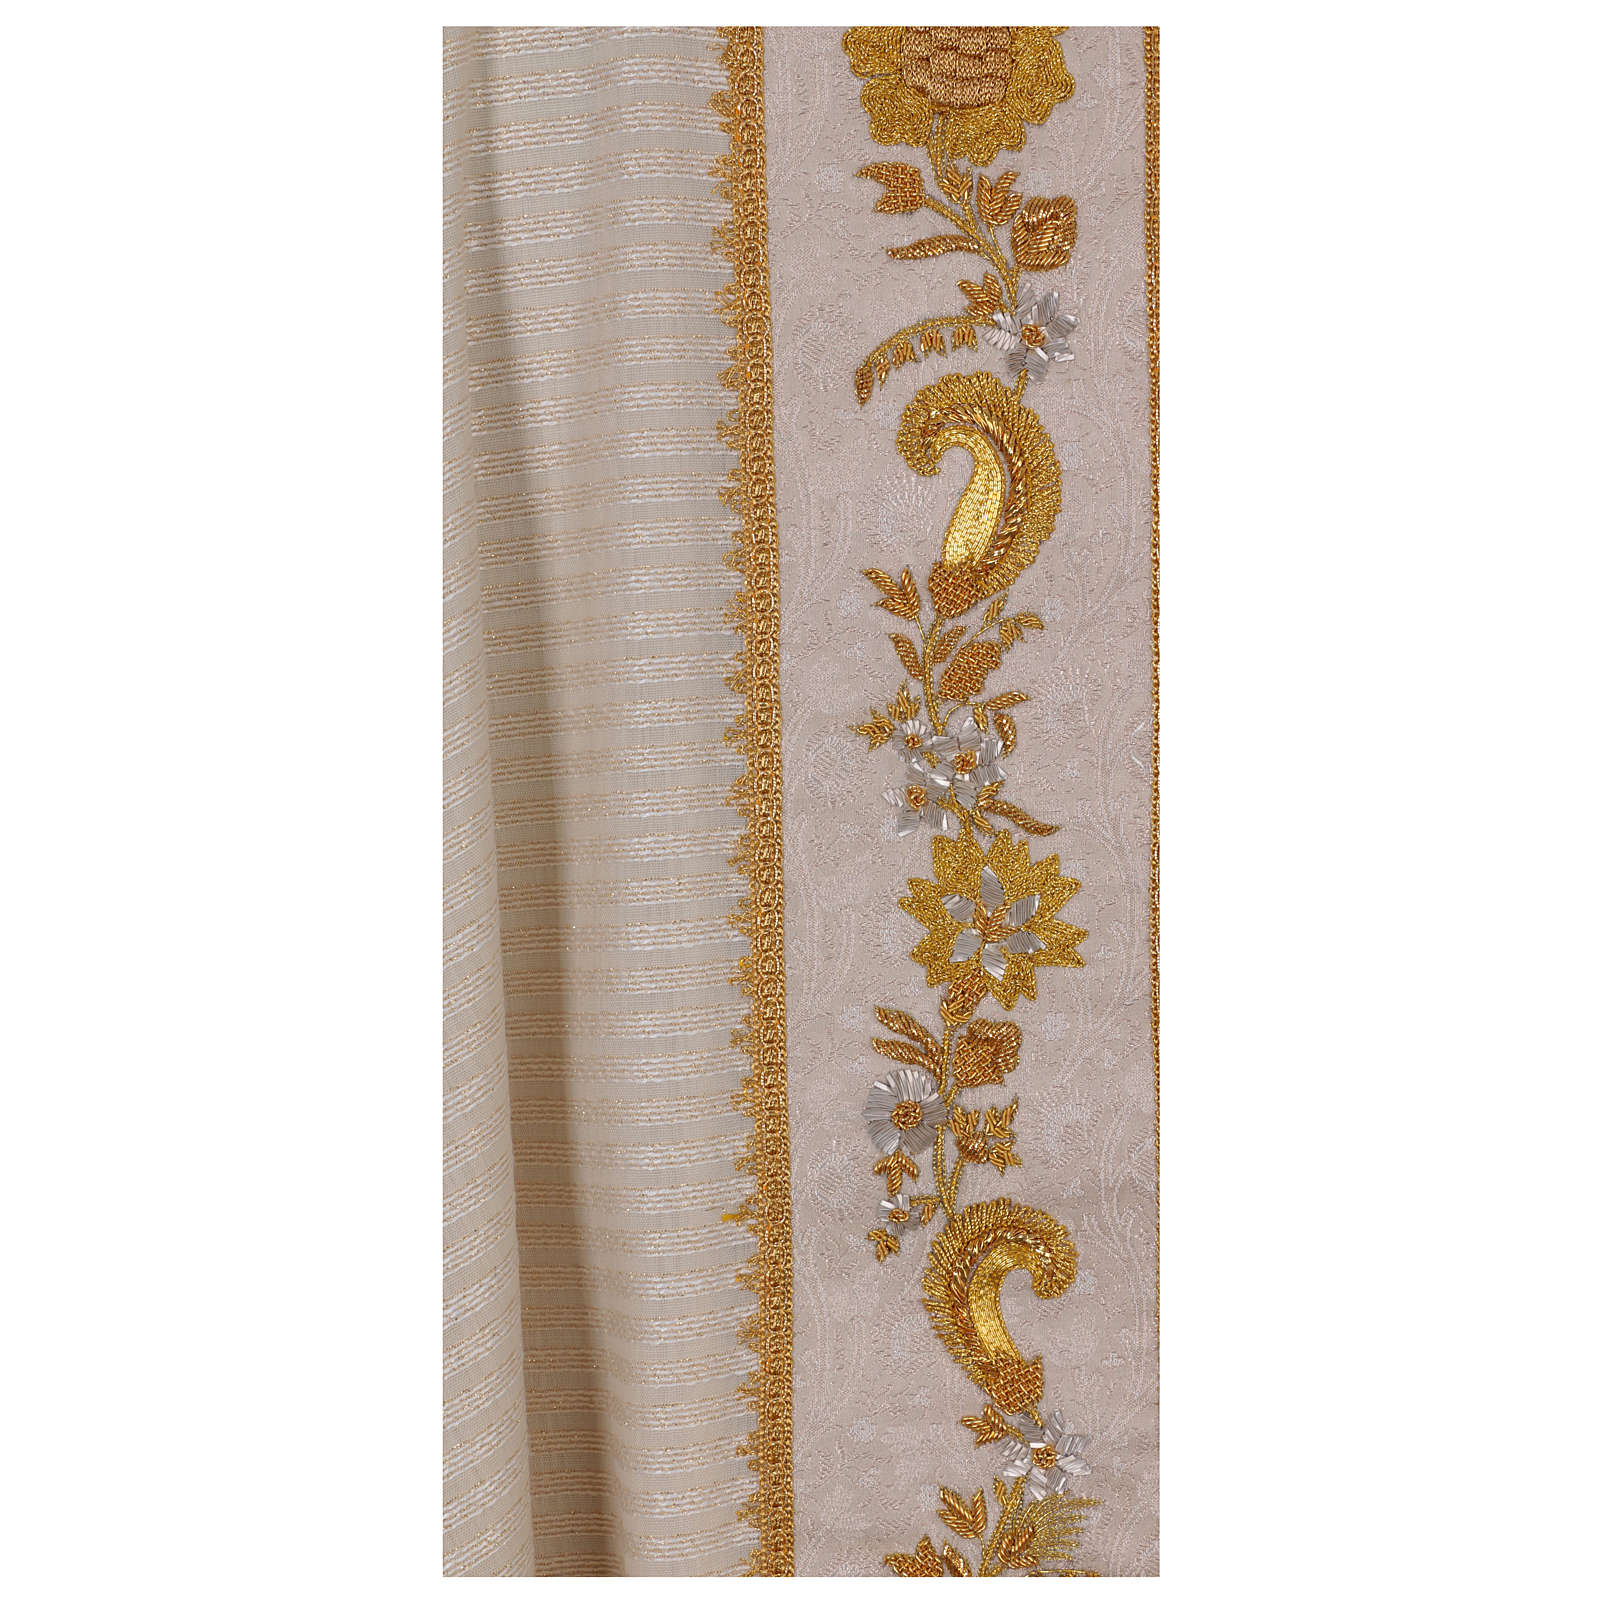 Casula 100% lana lurex leggerissimo stolone damascato ricamato 4